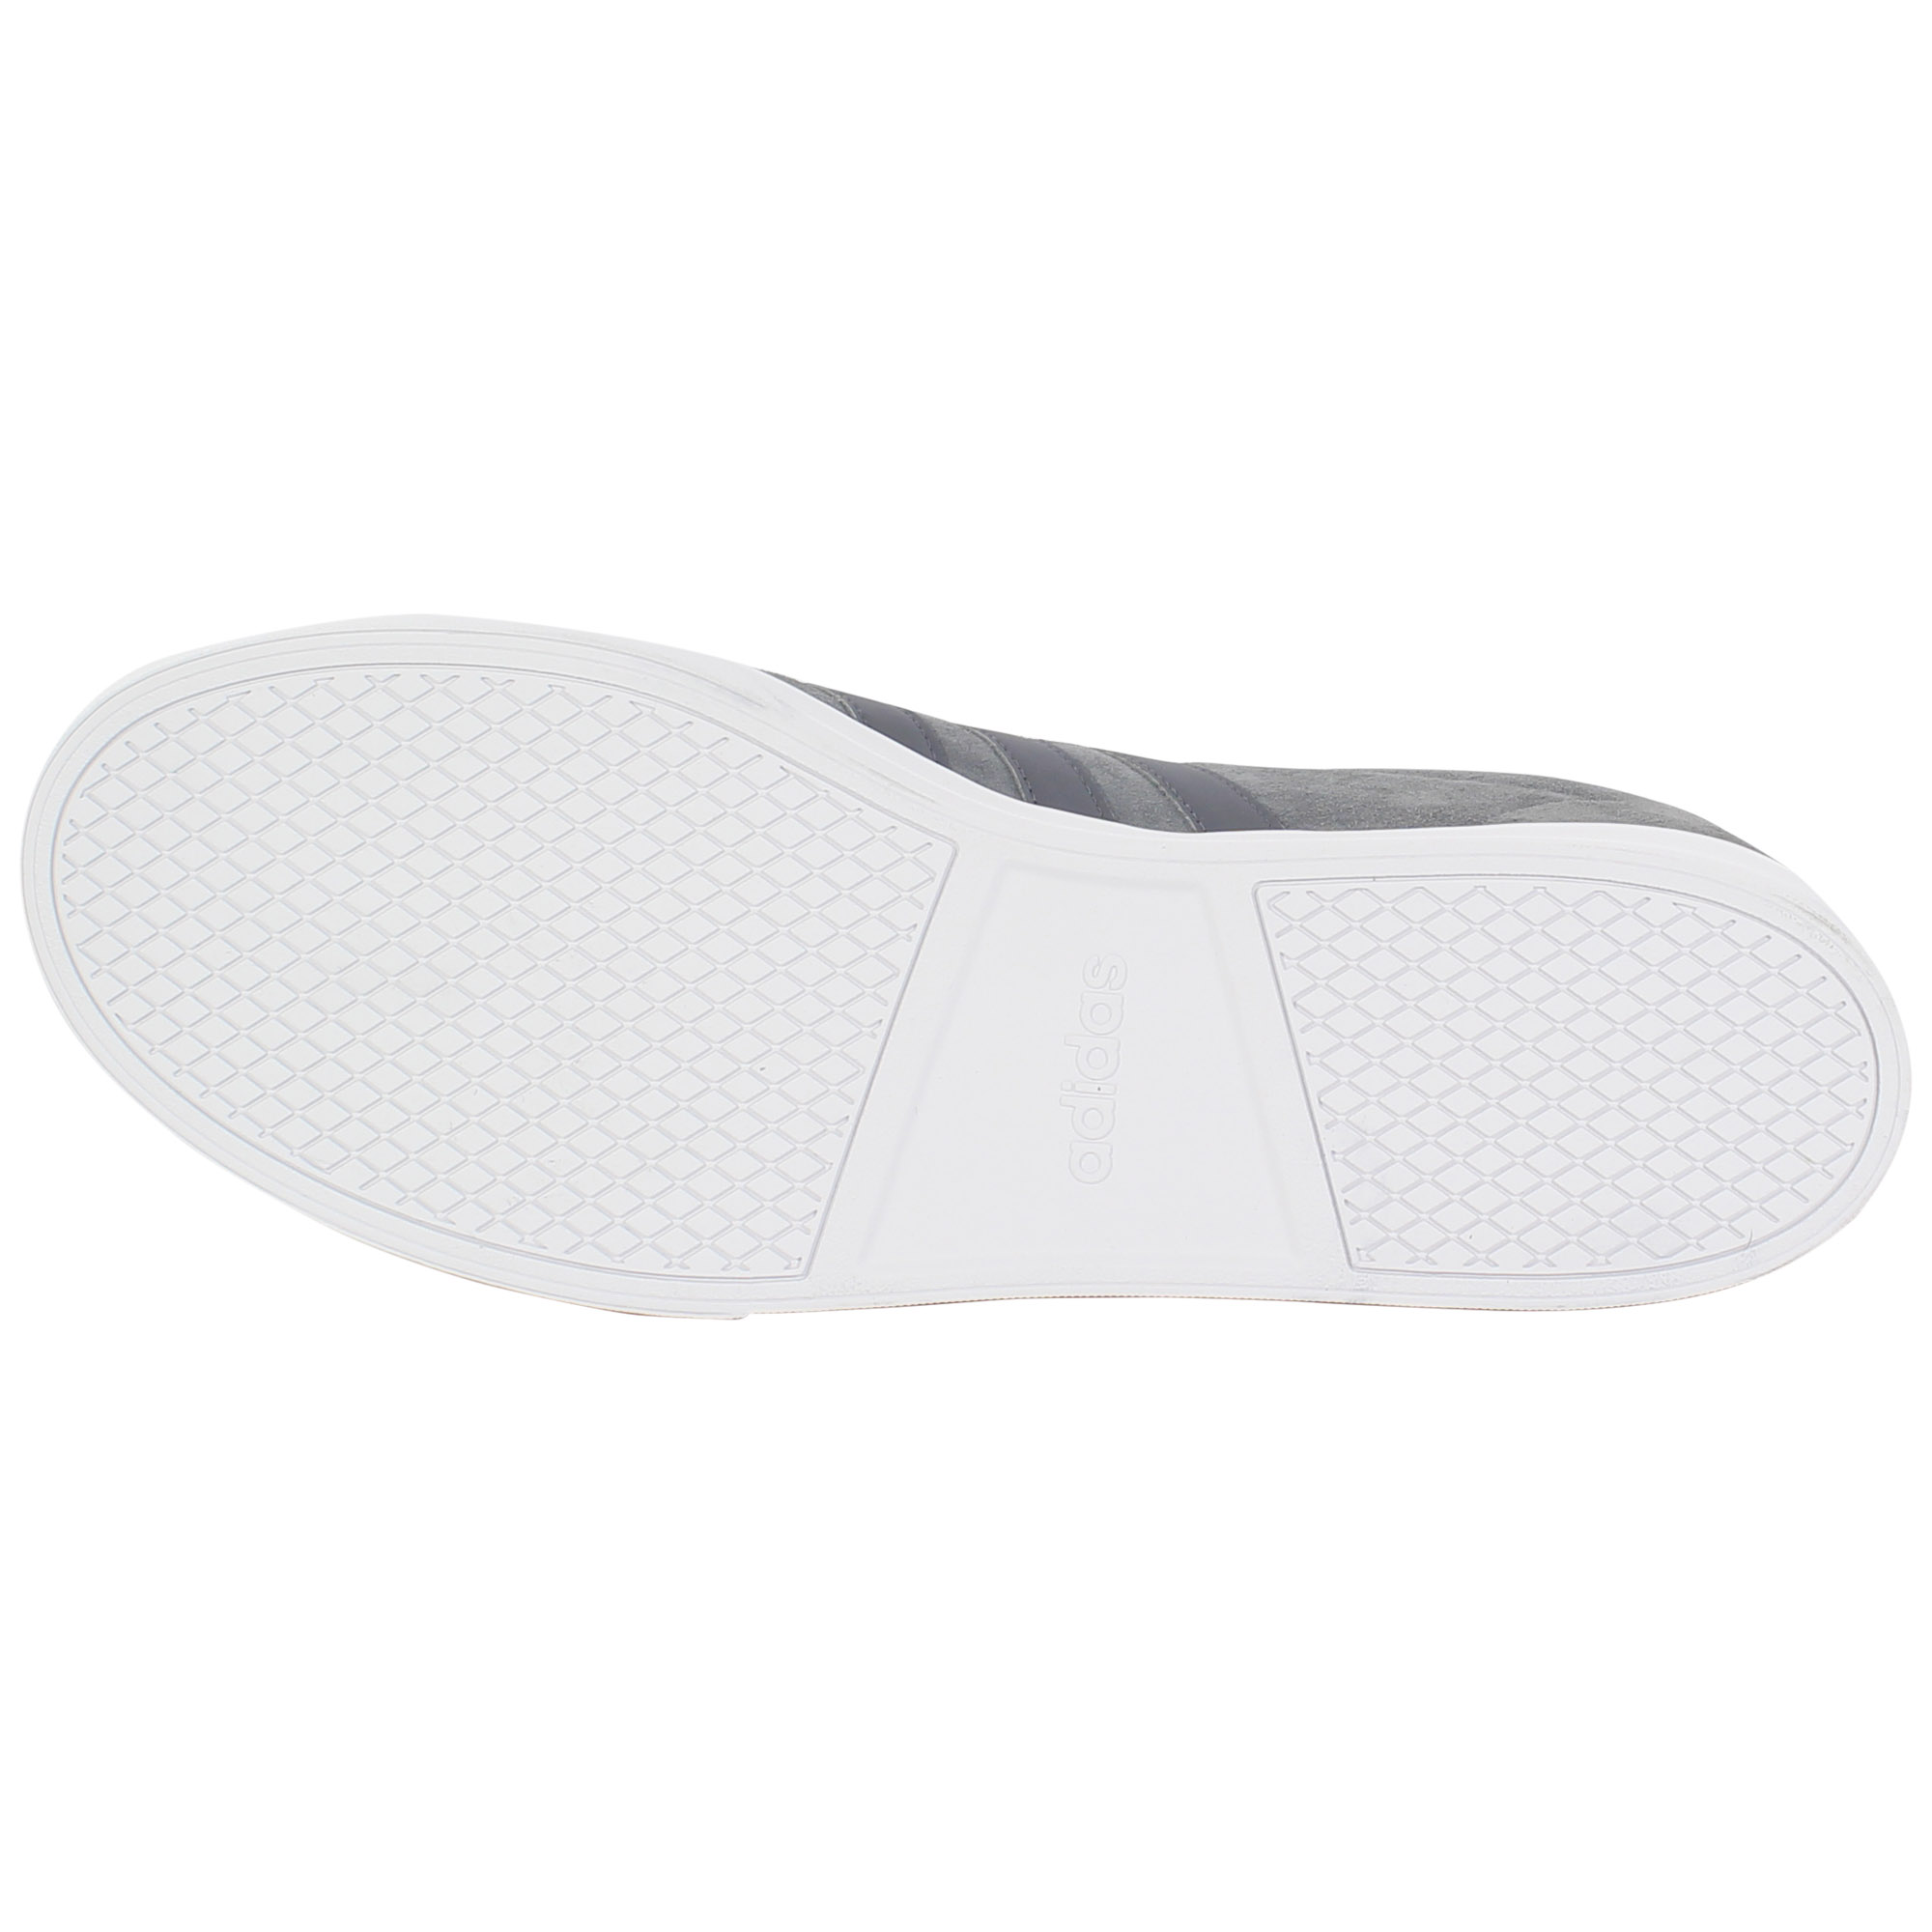 super popular 364af a8c91 adidas Sneaker große Größen - DAILY 2.0 - grau